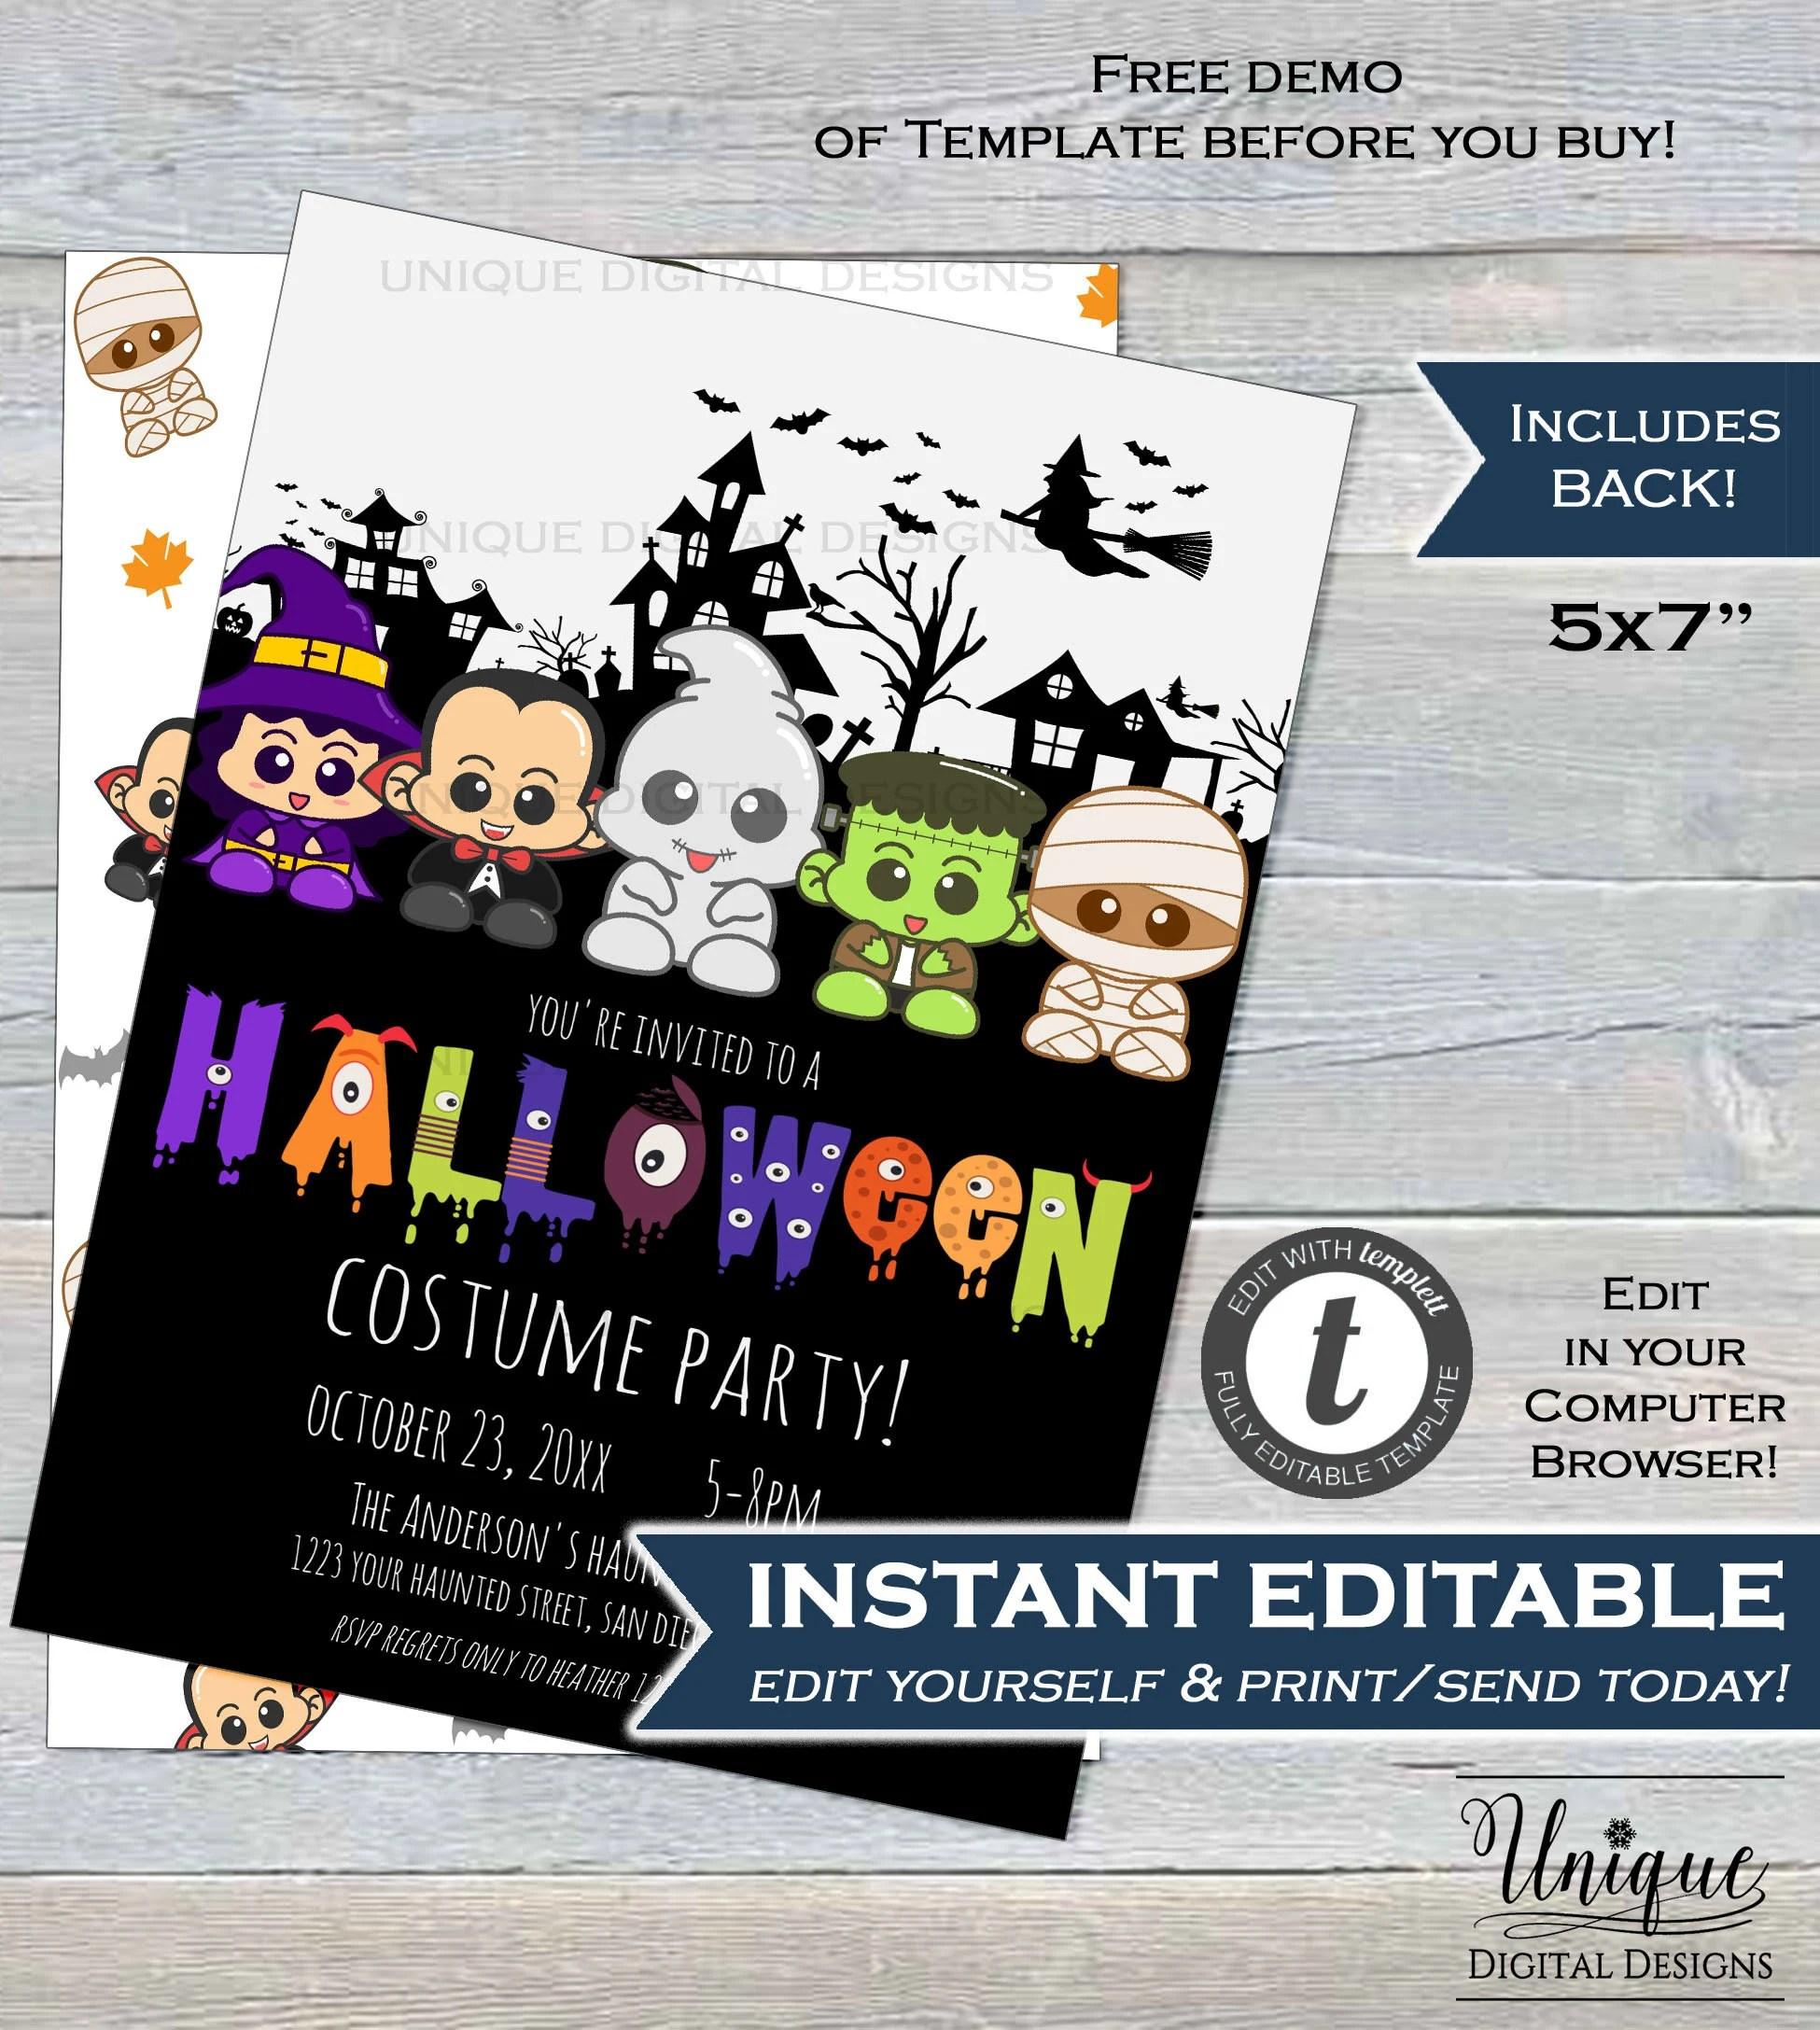 Halloween Costume Party Invitation Editable Halloween Party Etsy